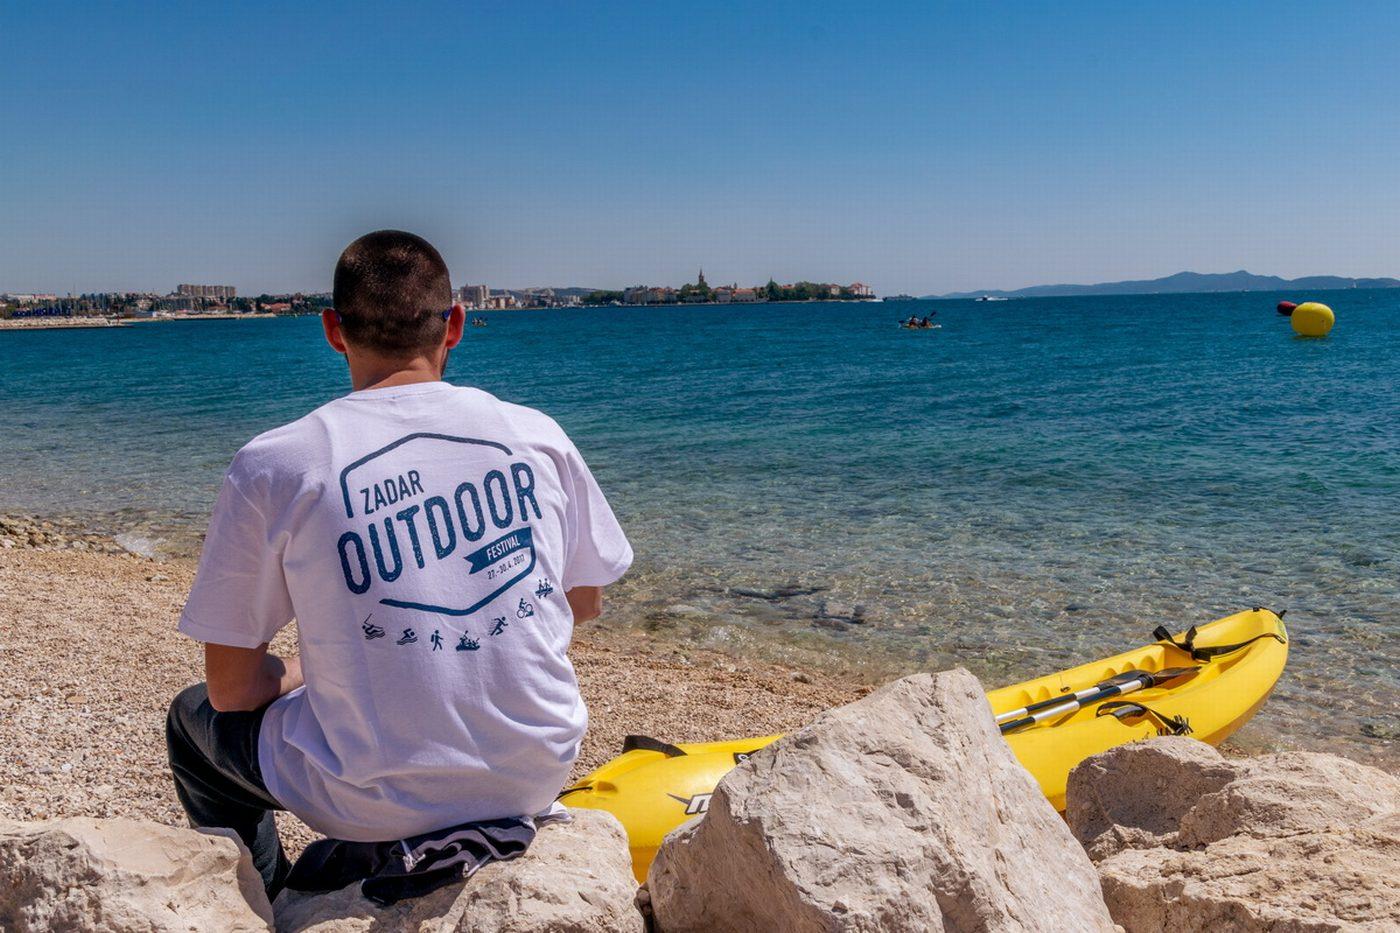 Zadar Outdoor Festival